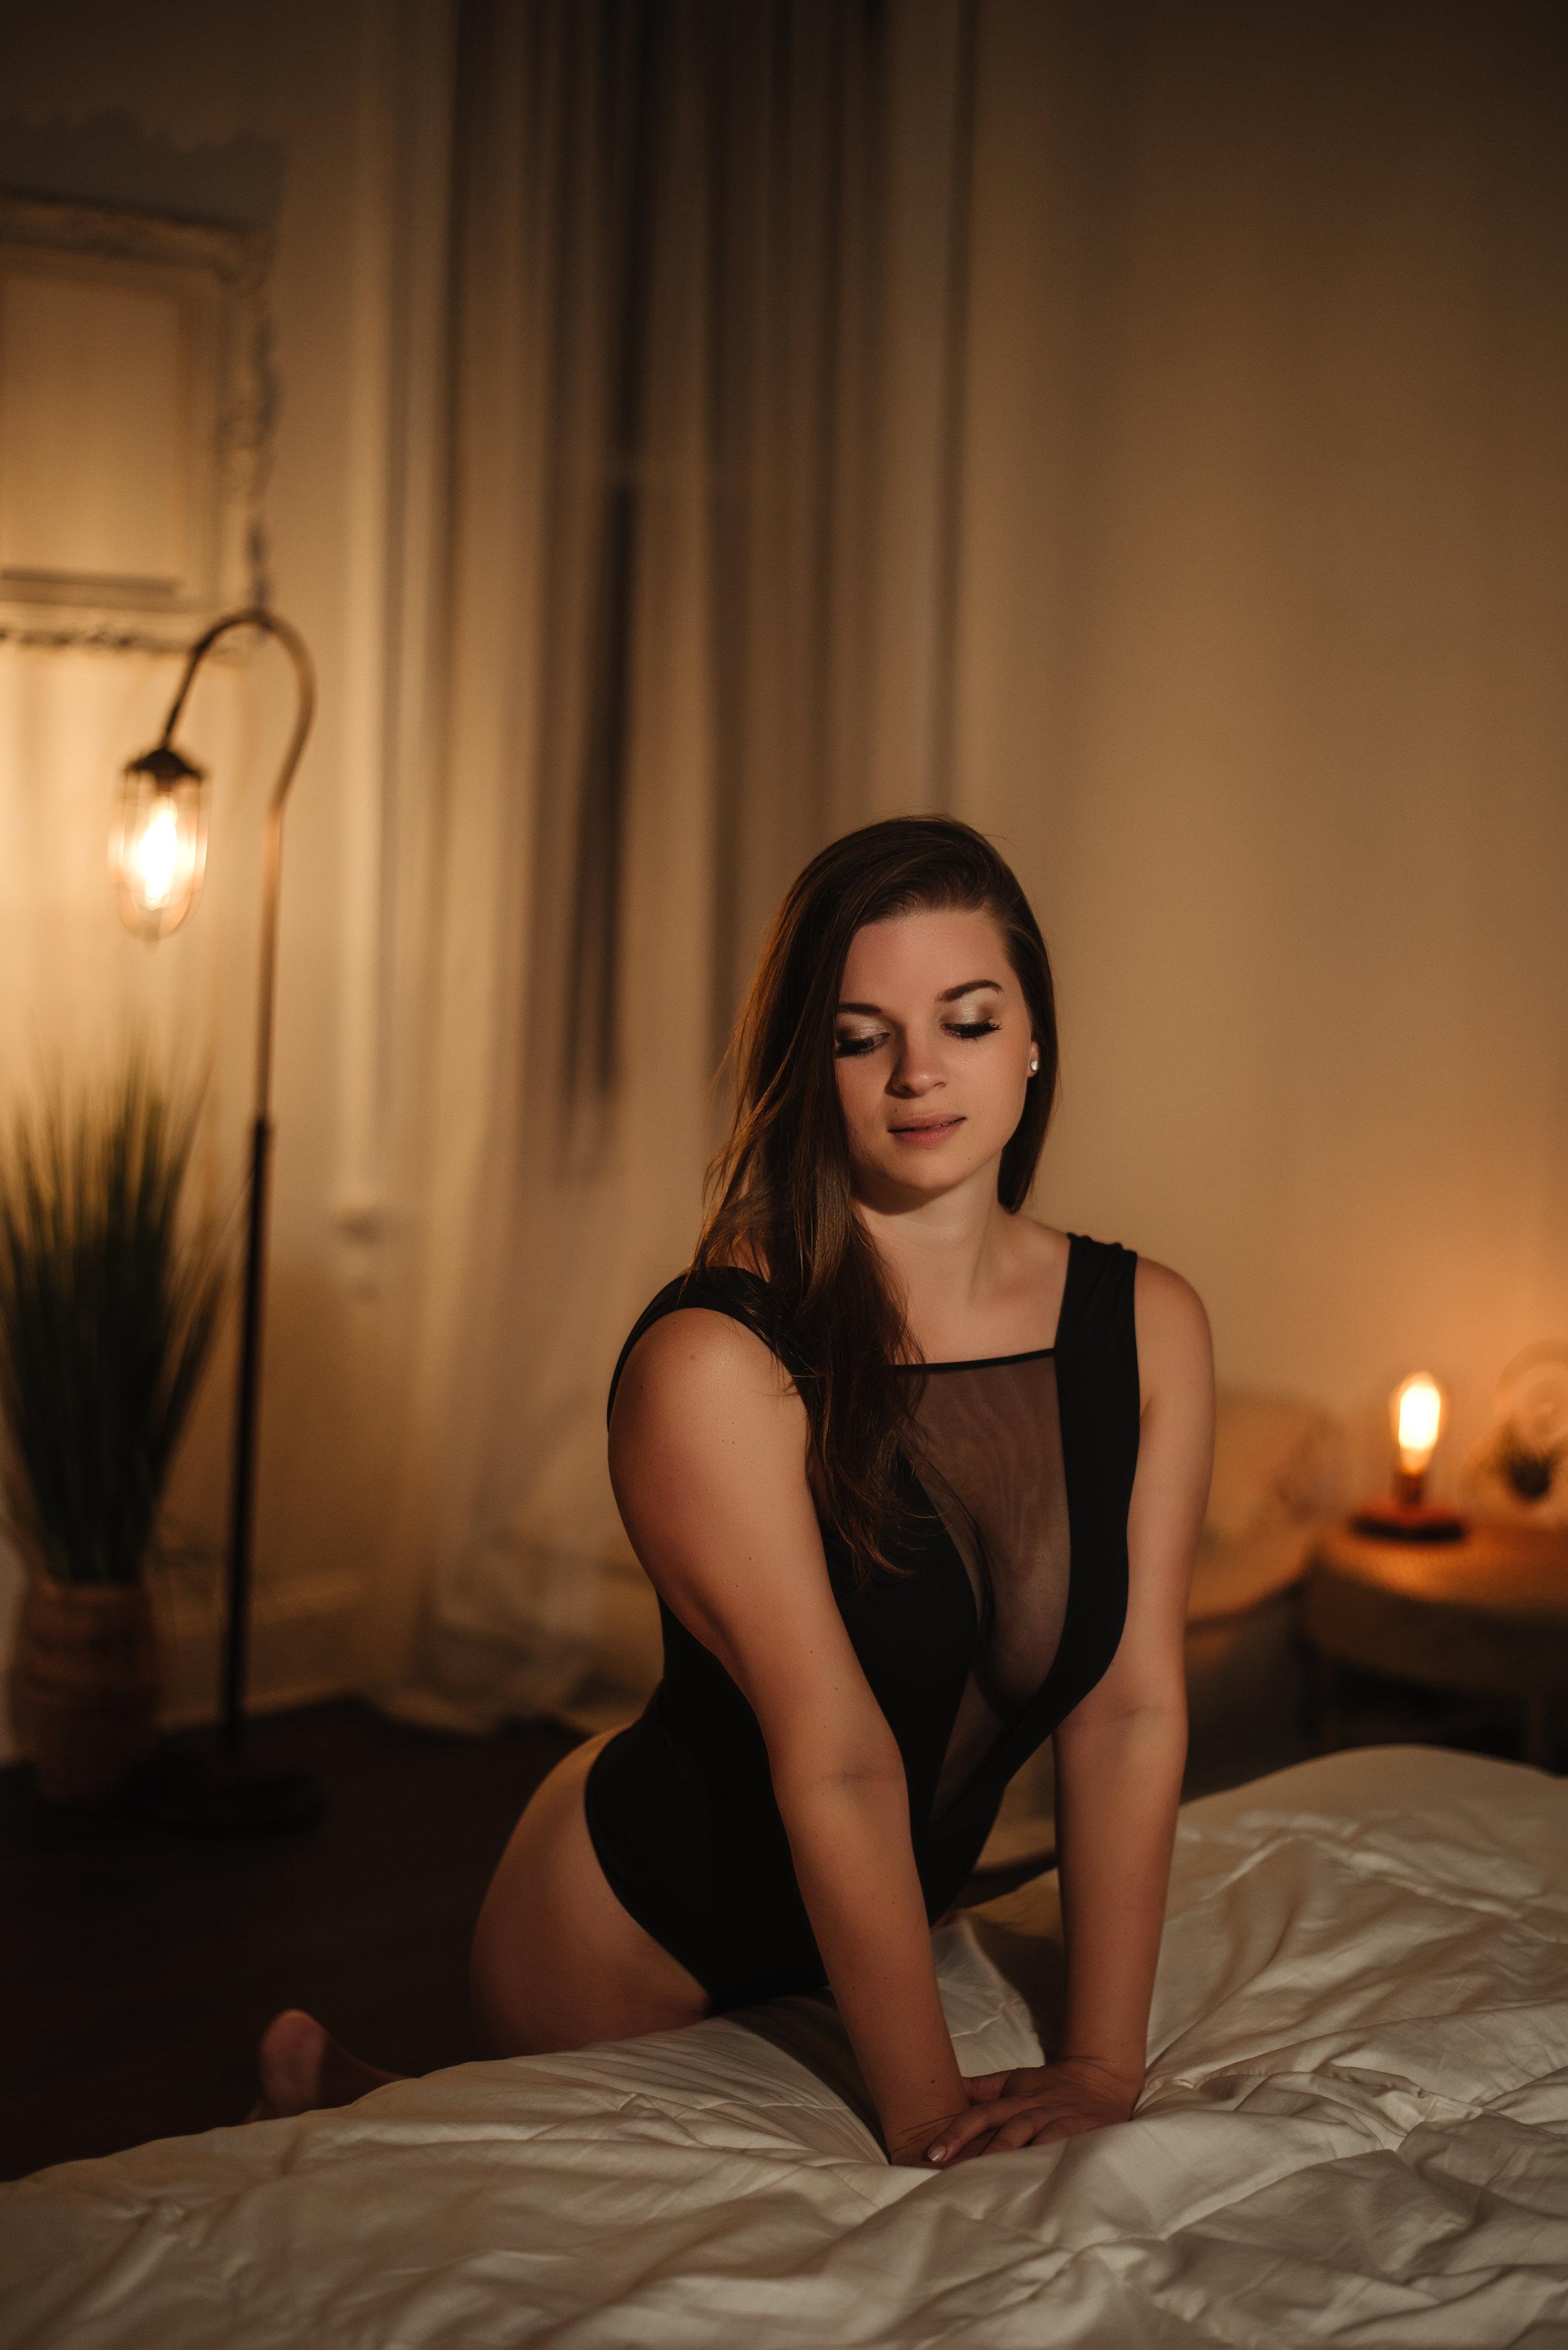 boudoir-photography-best-in-berks-16.jpg